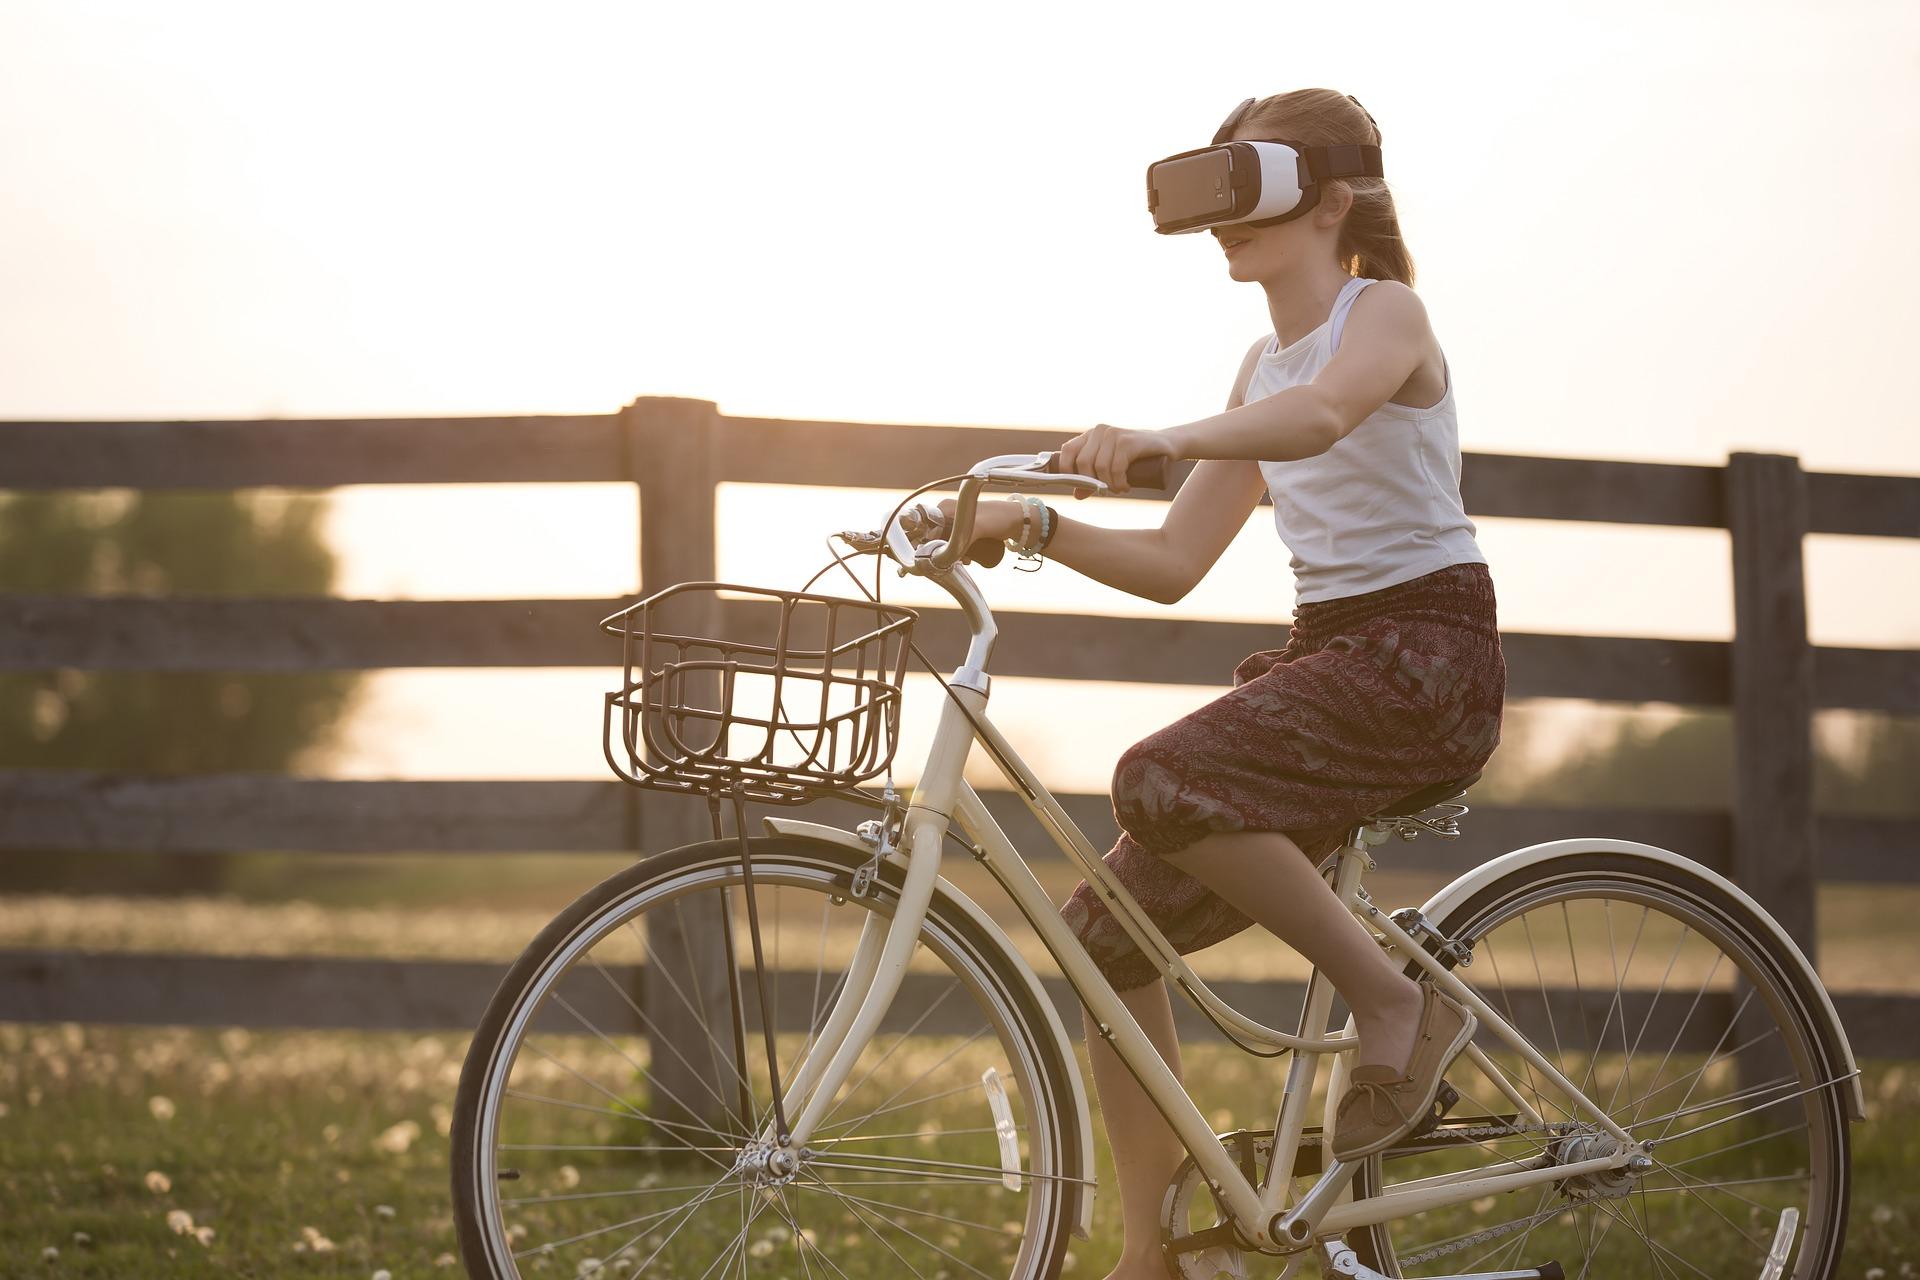 augmented-reality-1853592_1920.jpg